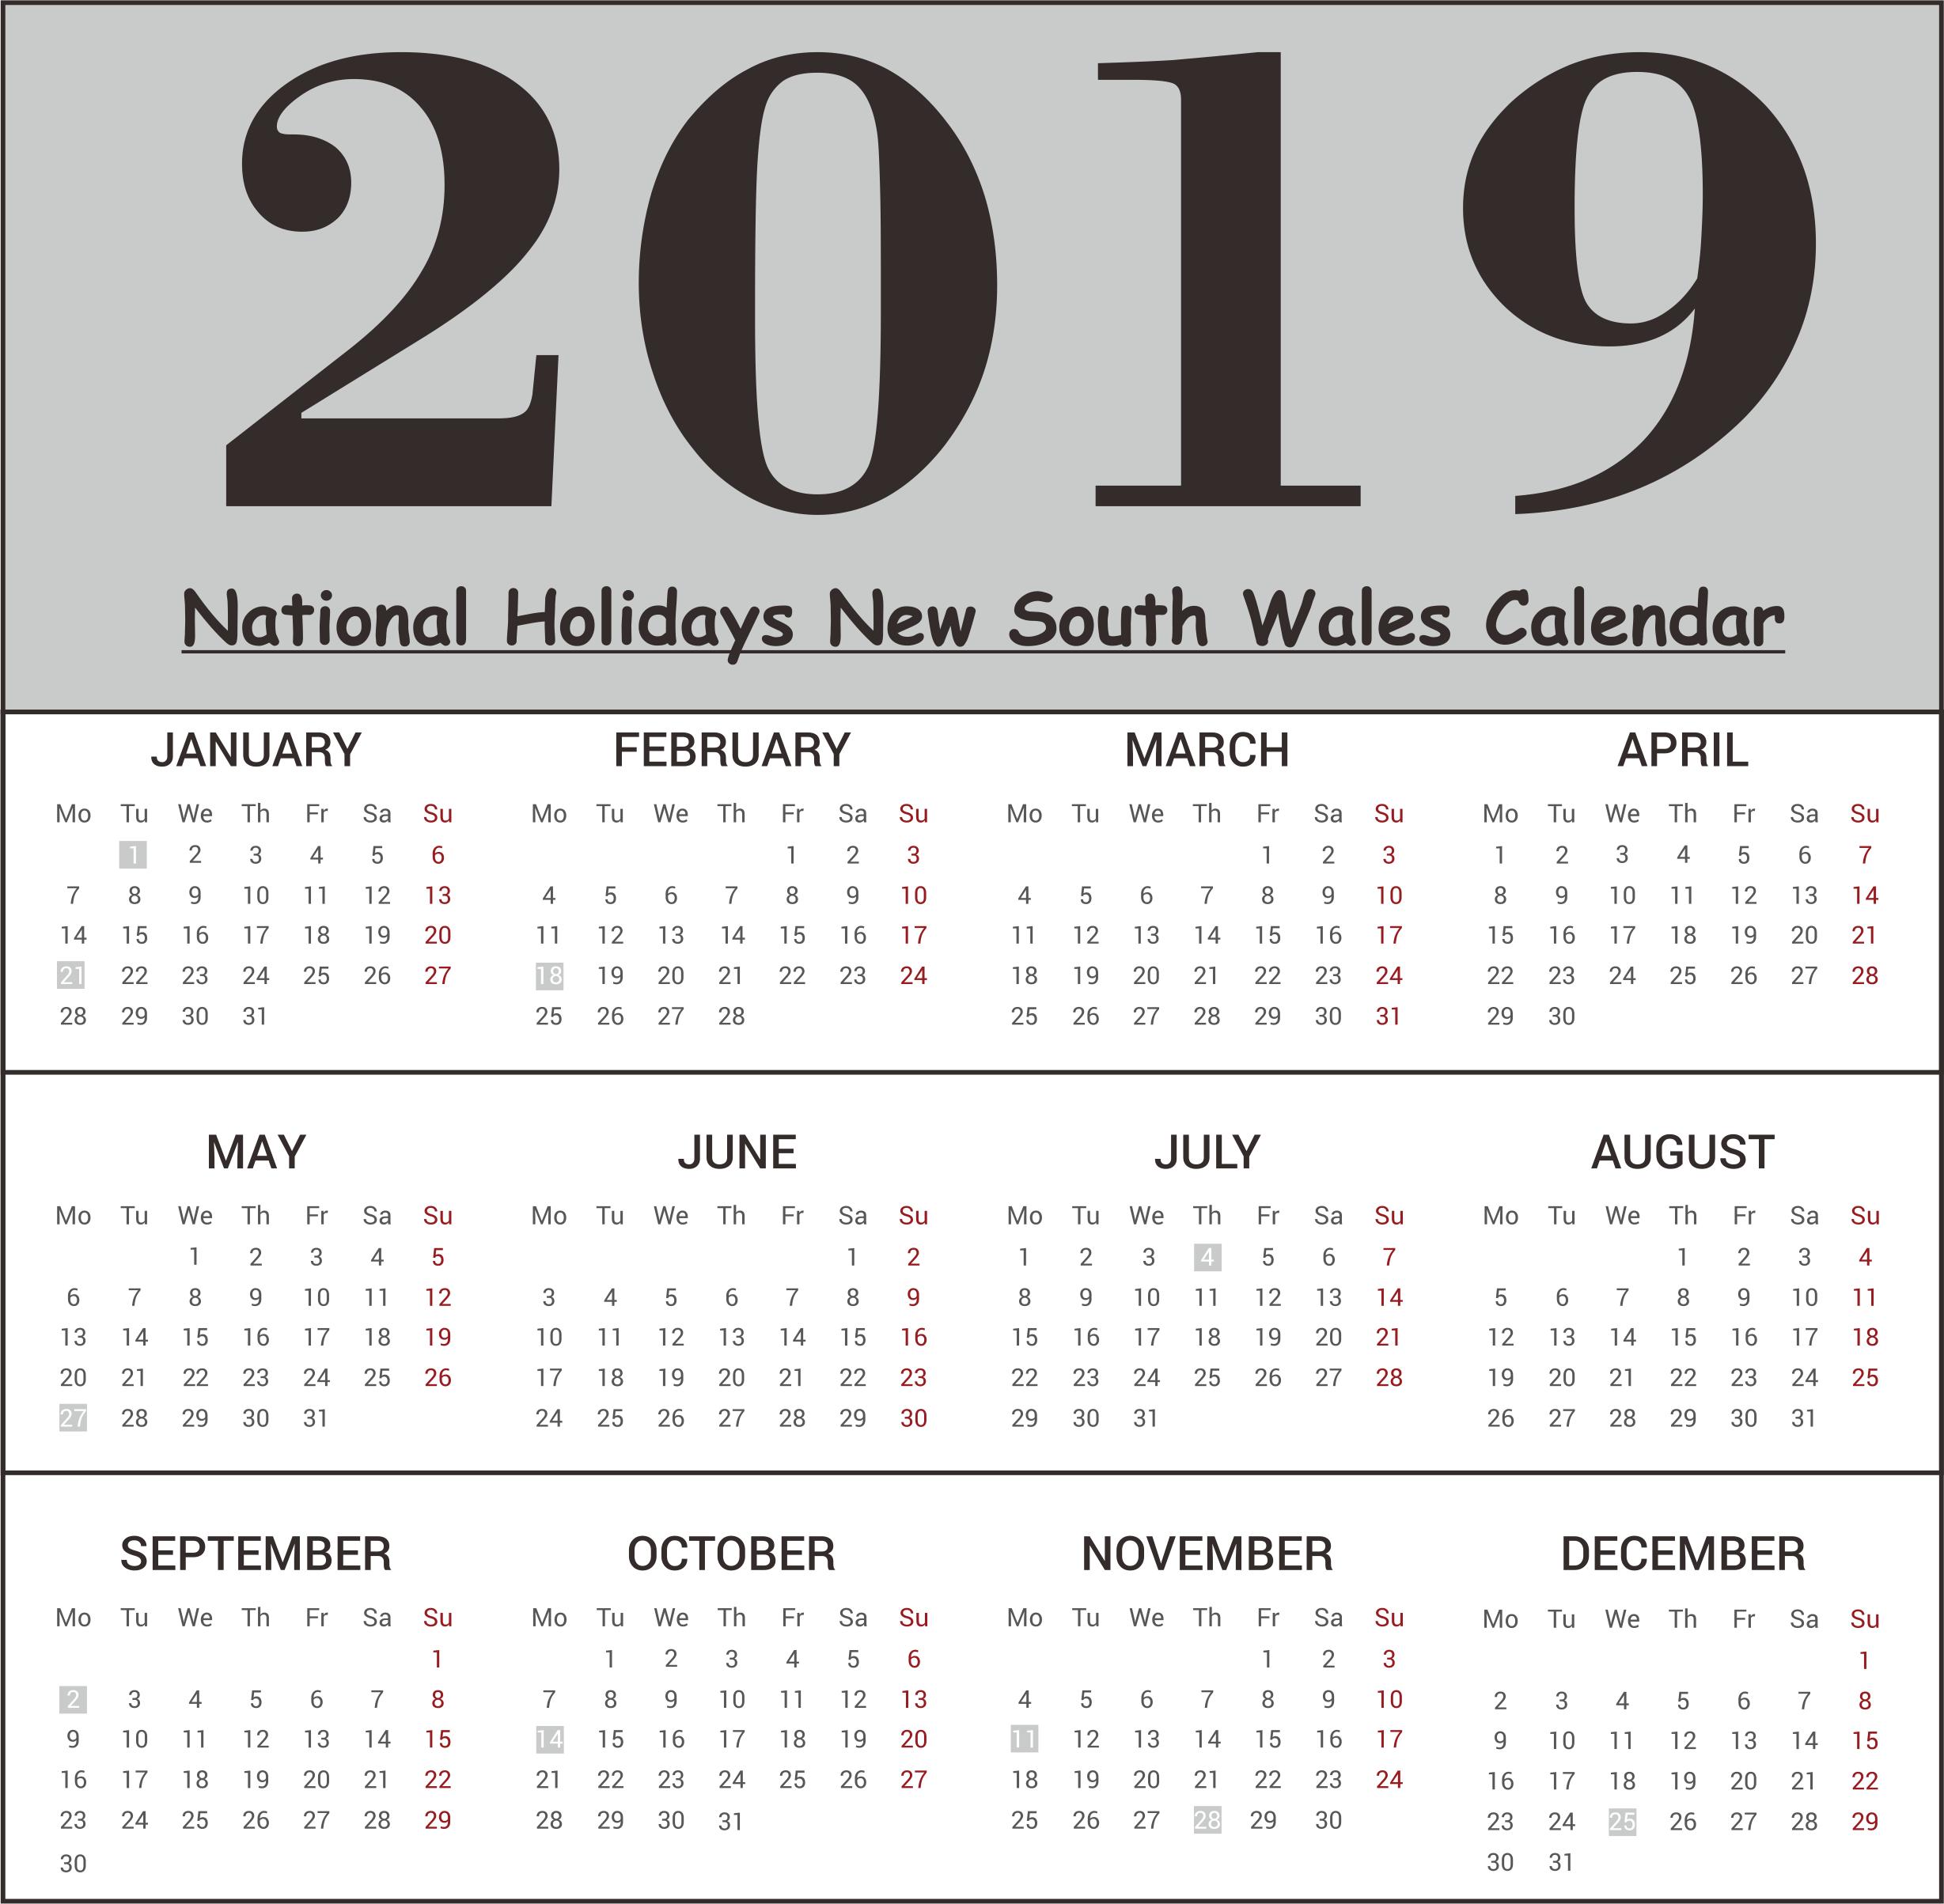 NSW National Holidays 2019 Calendar